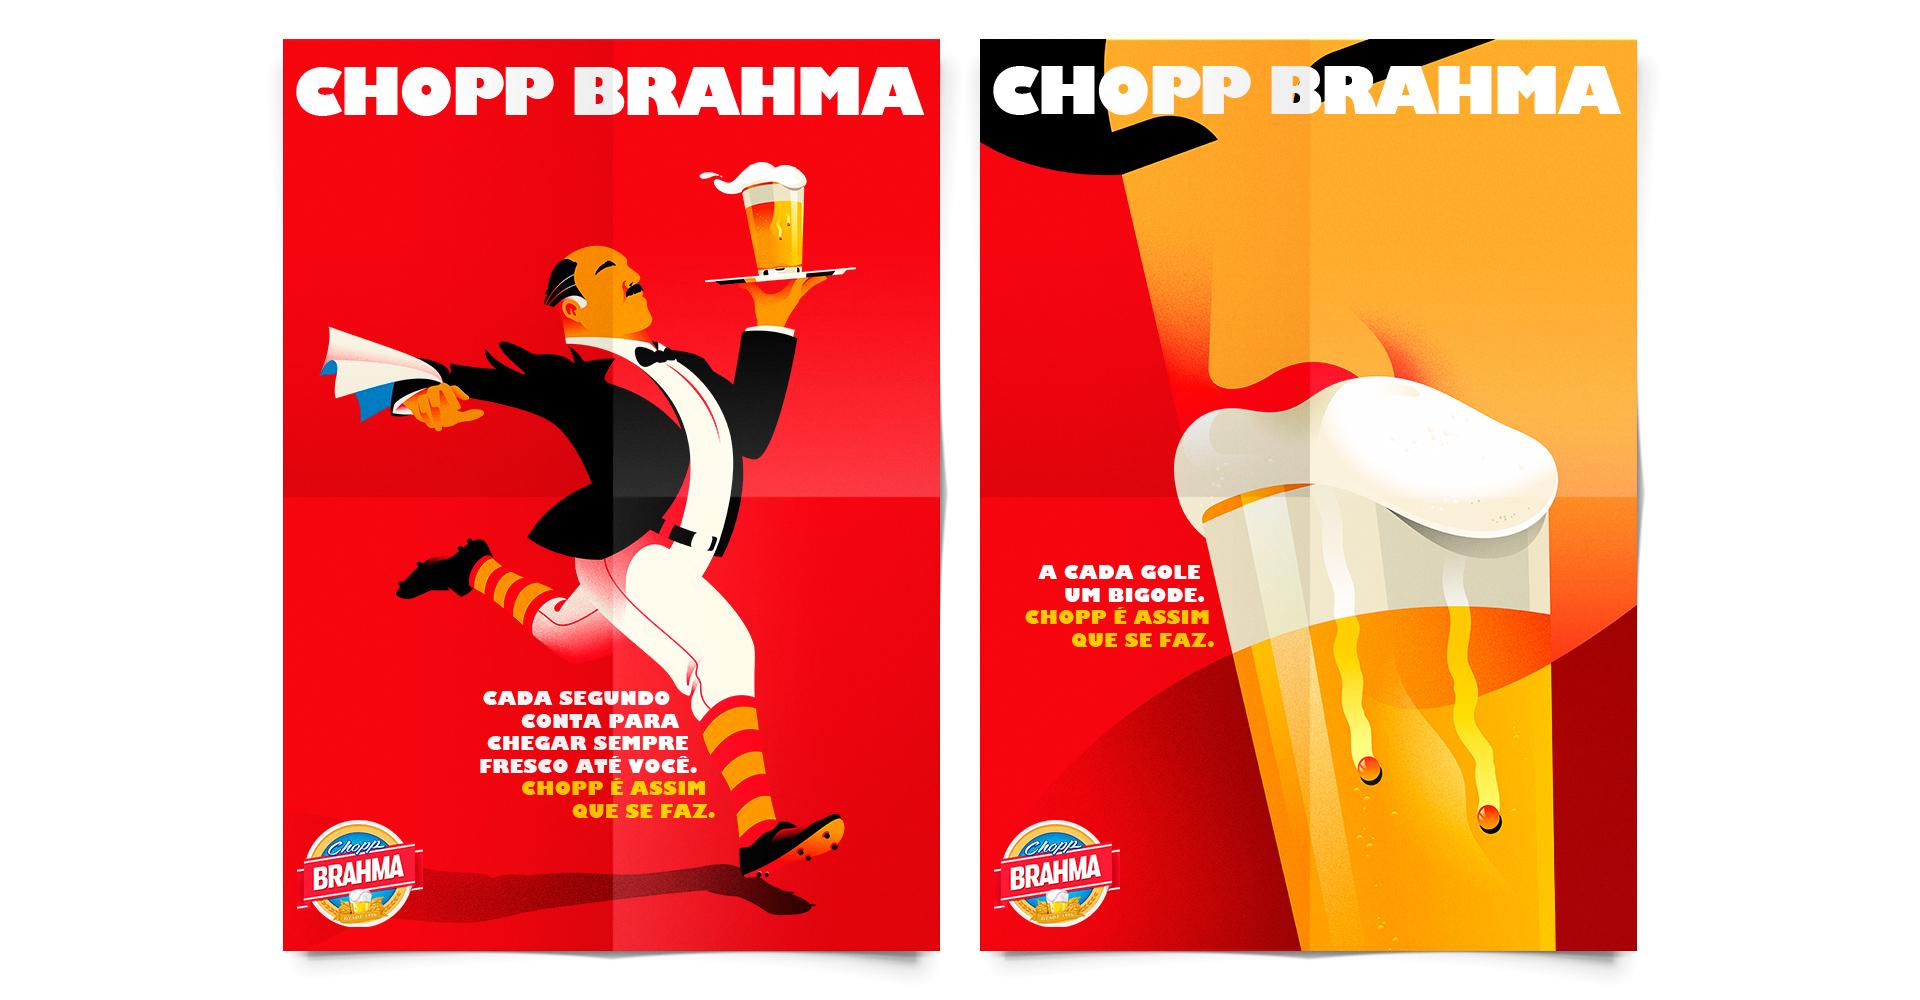 firmorama_chopp-brahma_03